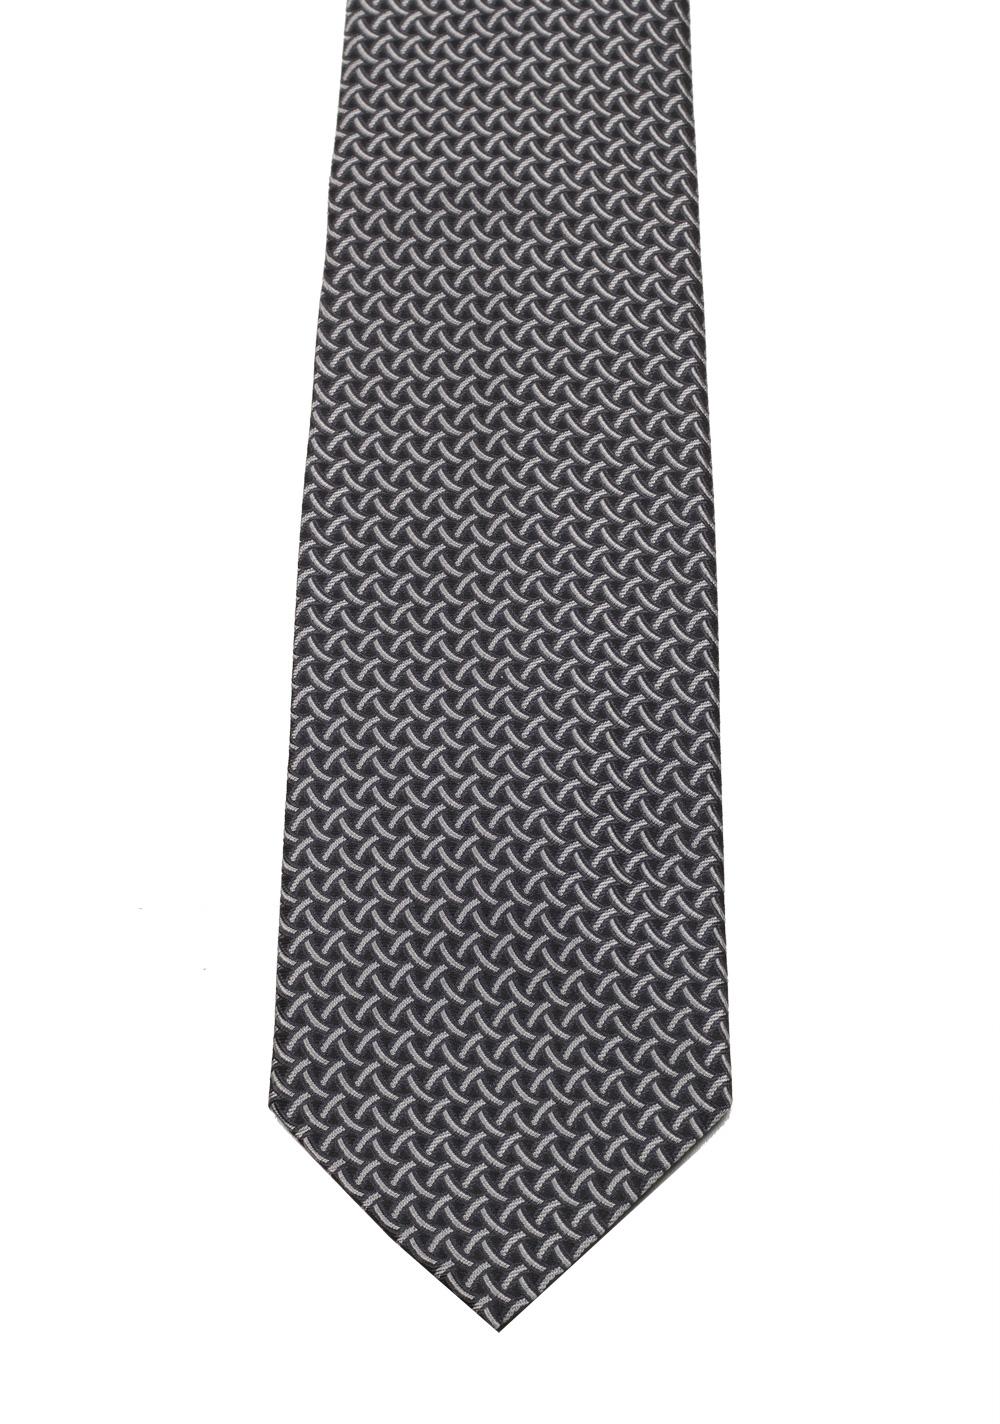 Gucci Gray Patterned Tie | Costume Limité